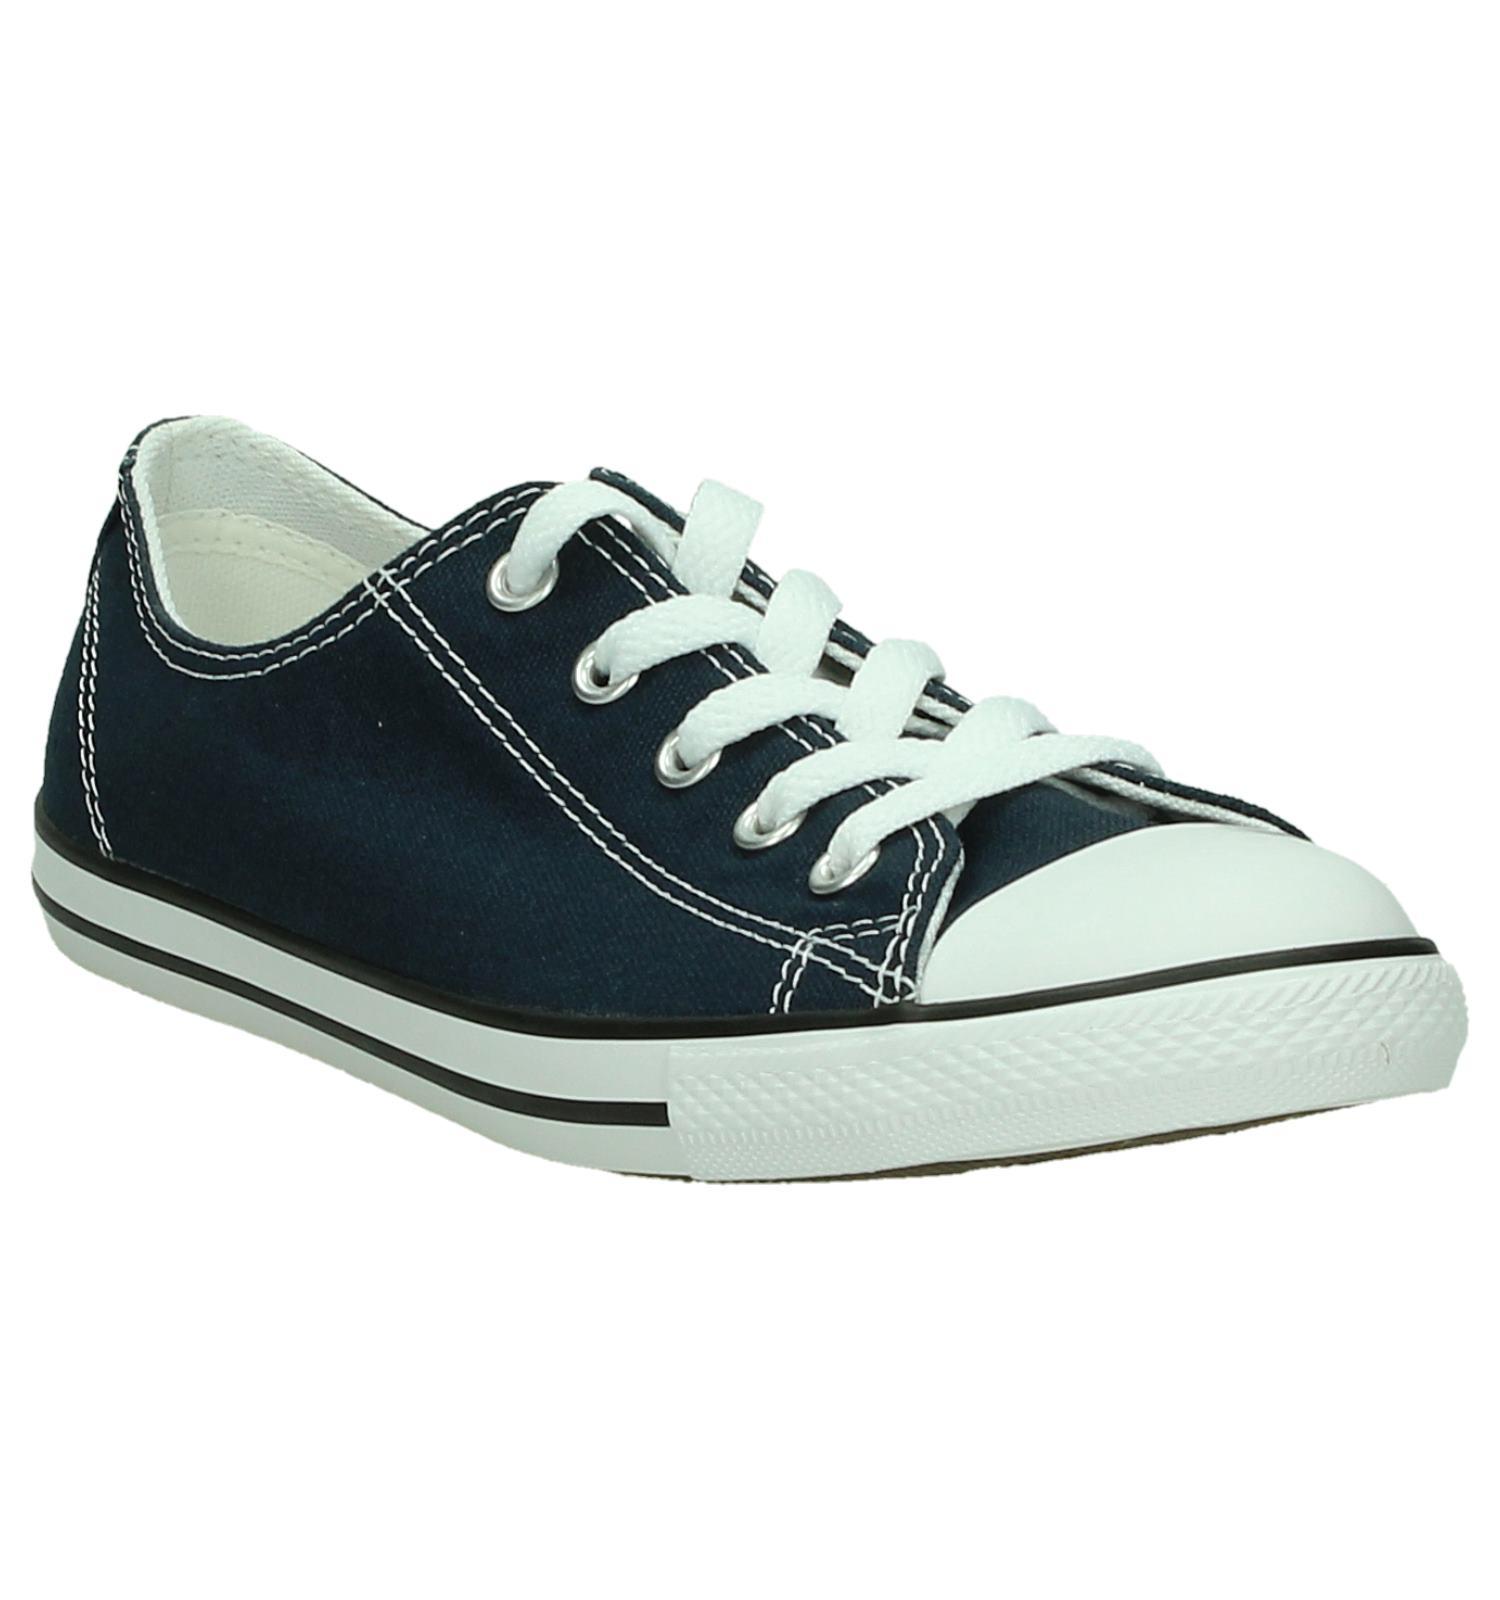 Sneakers Ct Converse Star Blauwe All Dainty zUMqVpGS